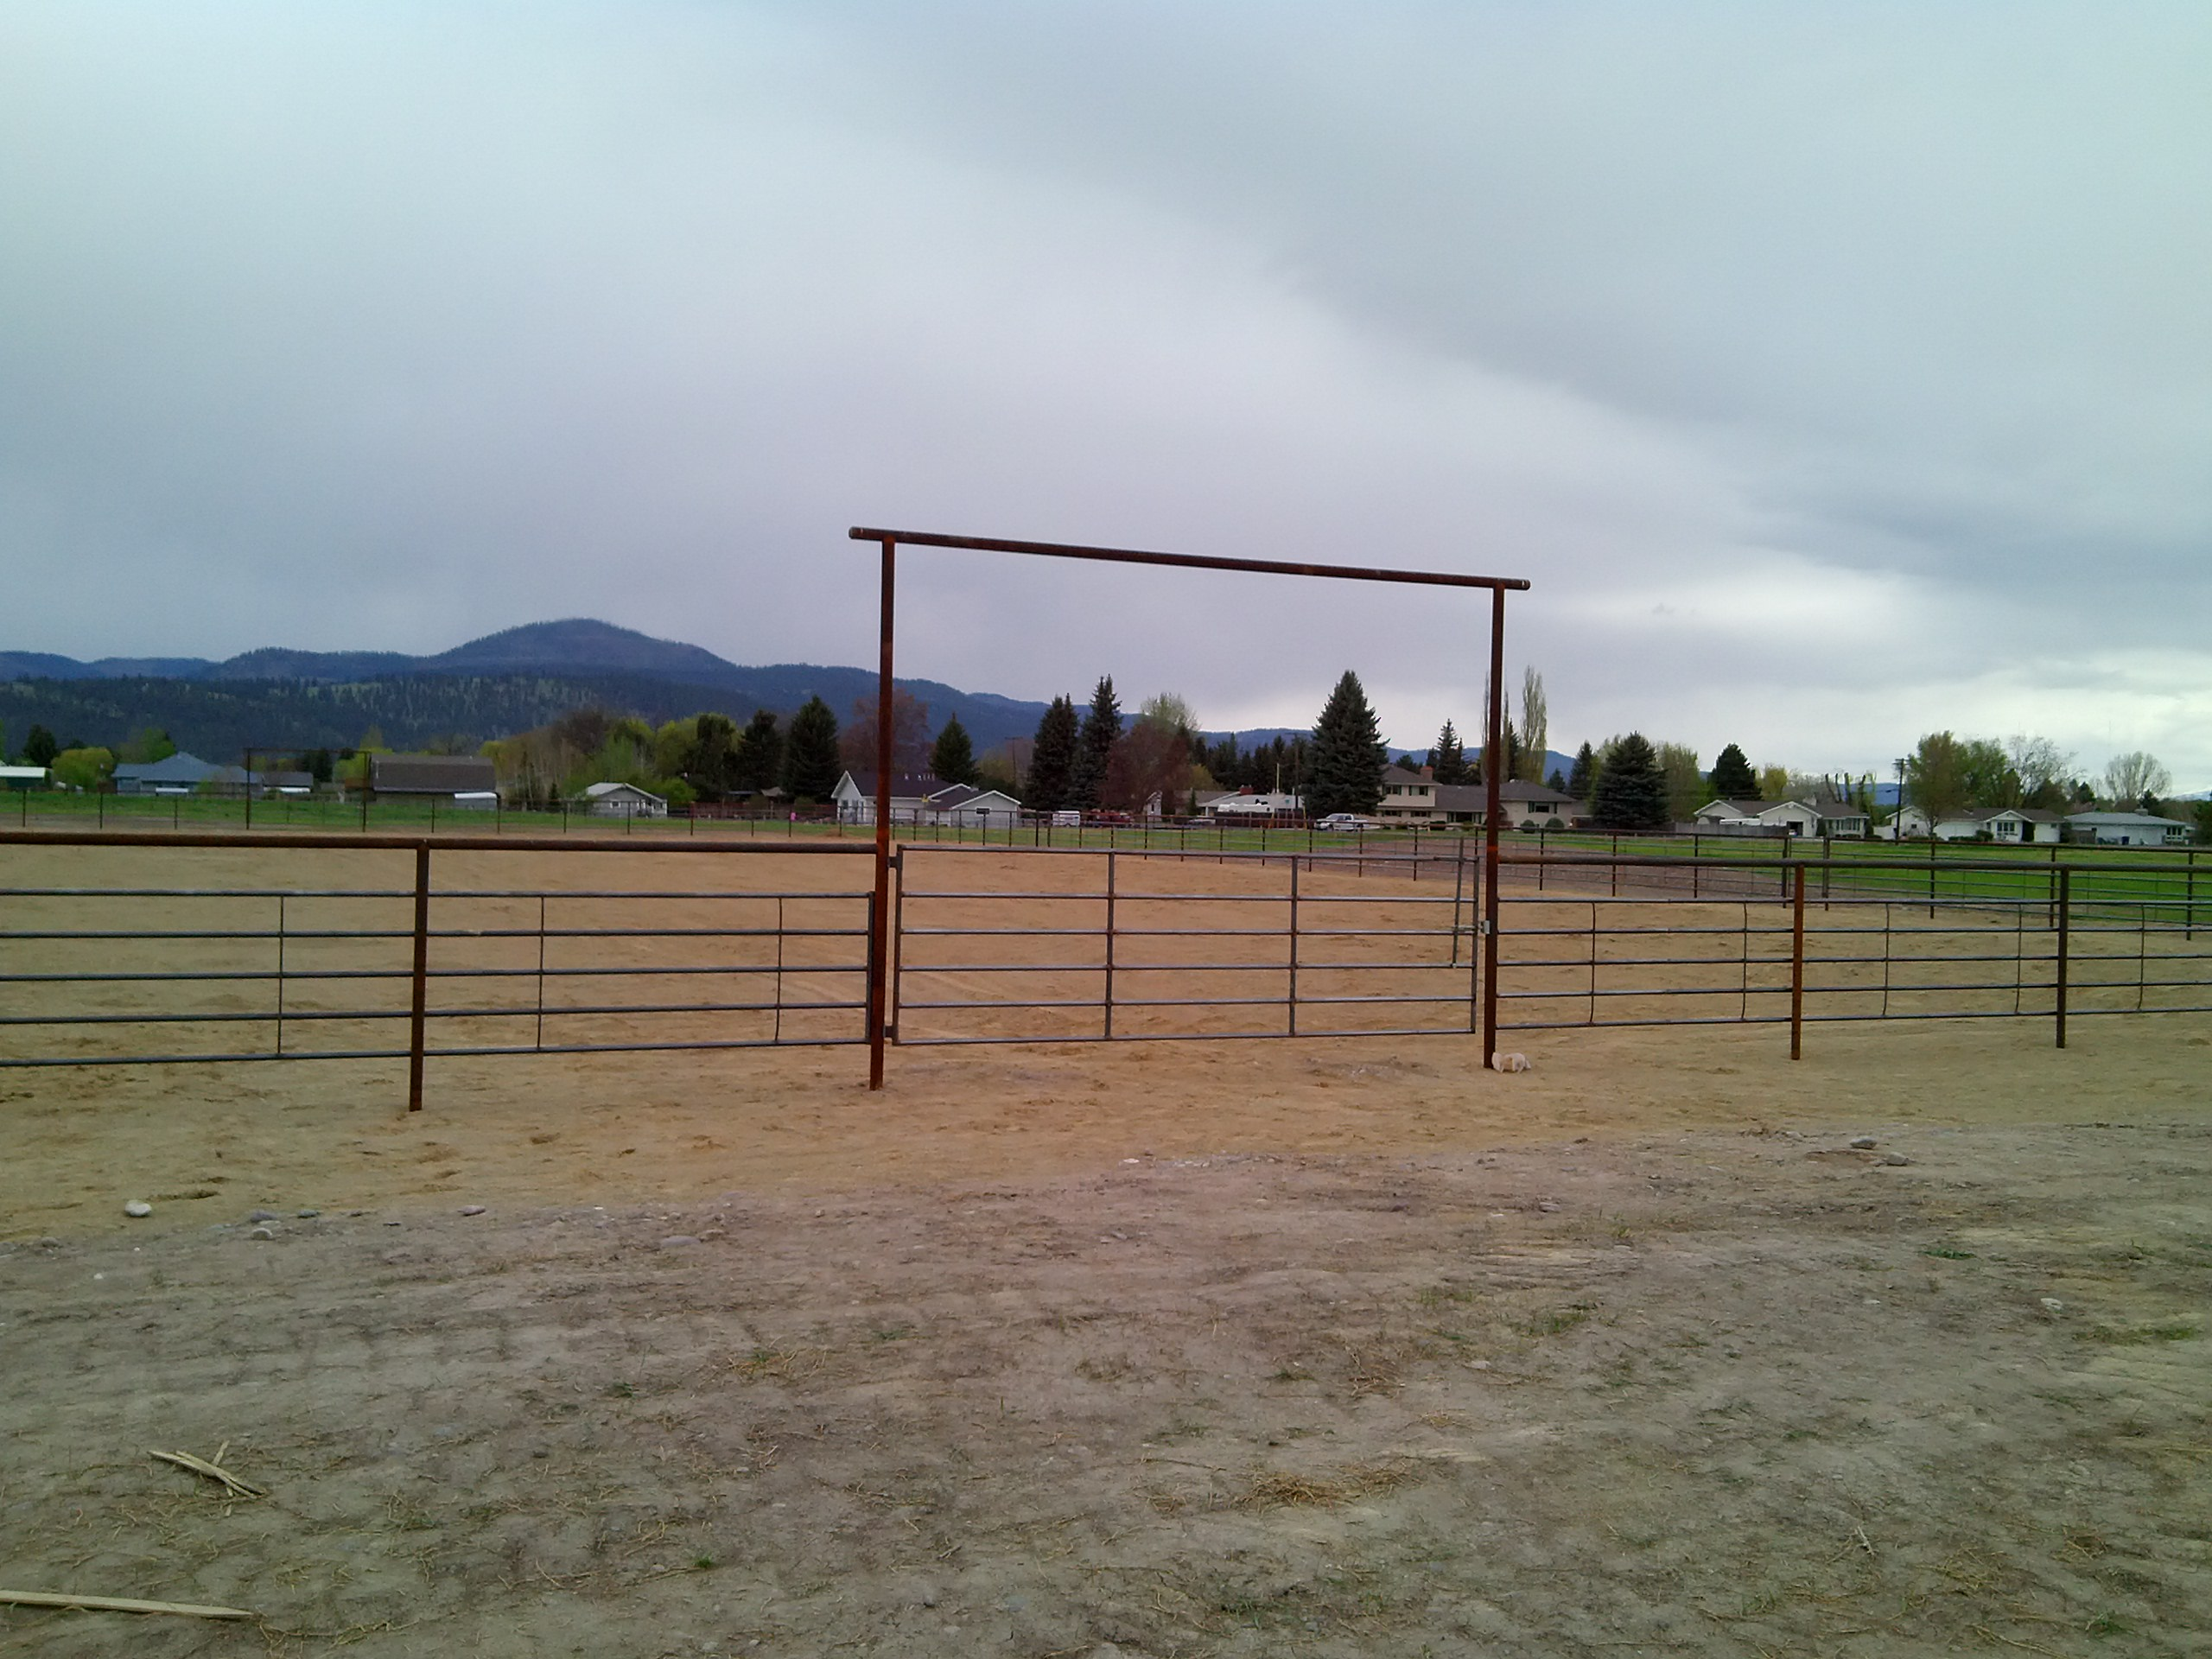 Arena fencing